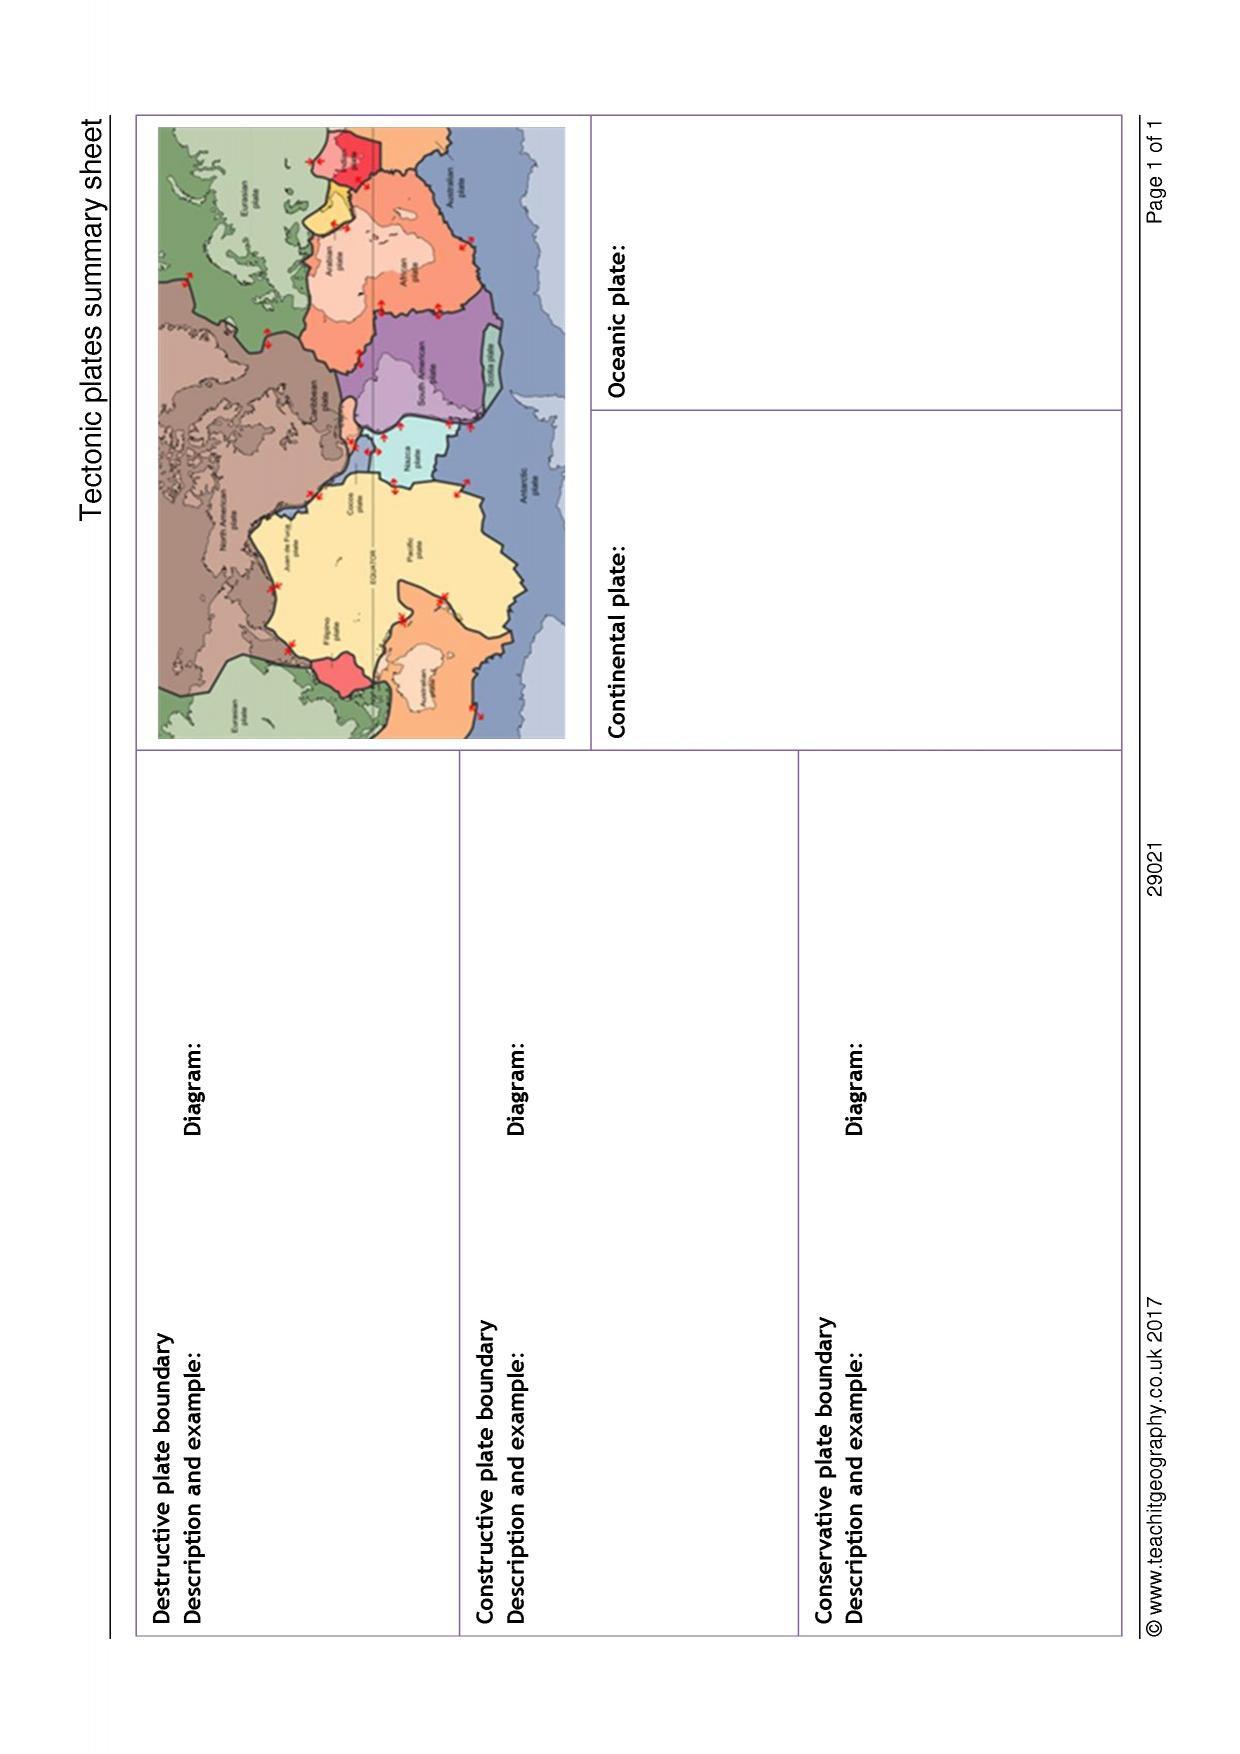 Plate Boundary Worksheet Answers Ks4 Plate Boundaries